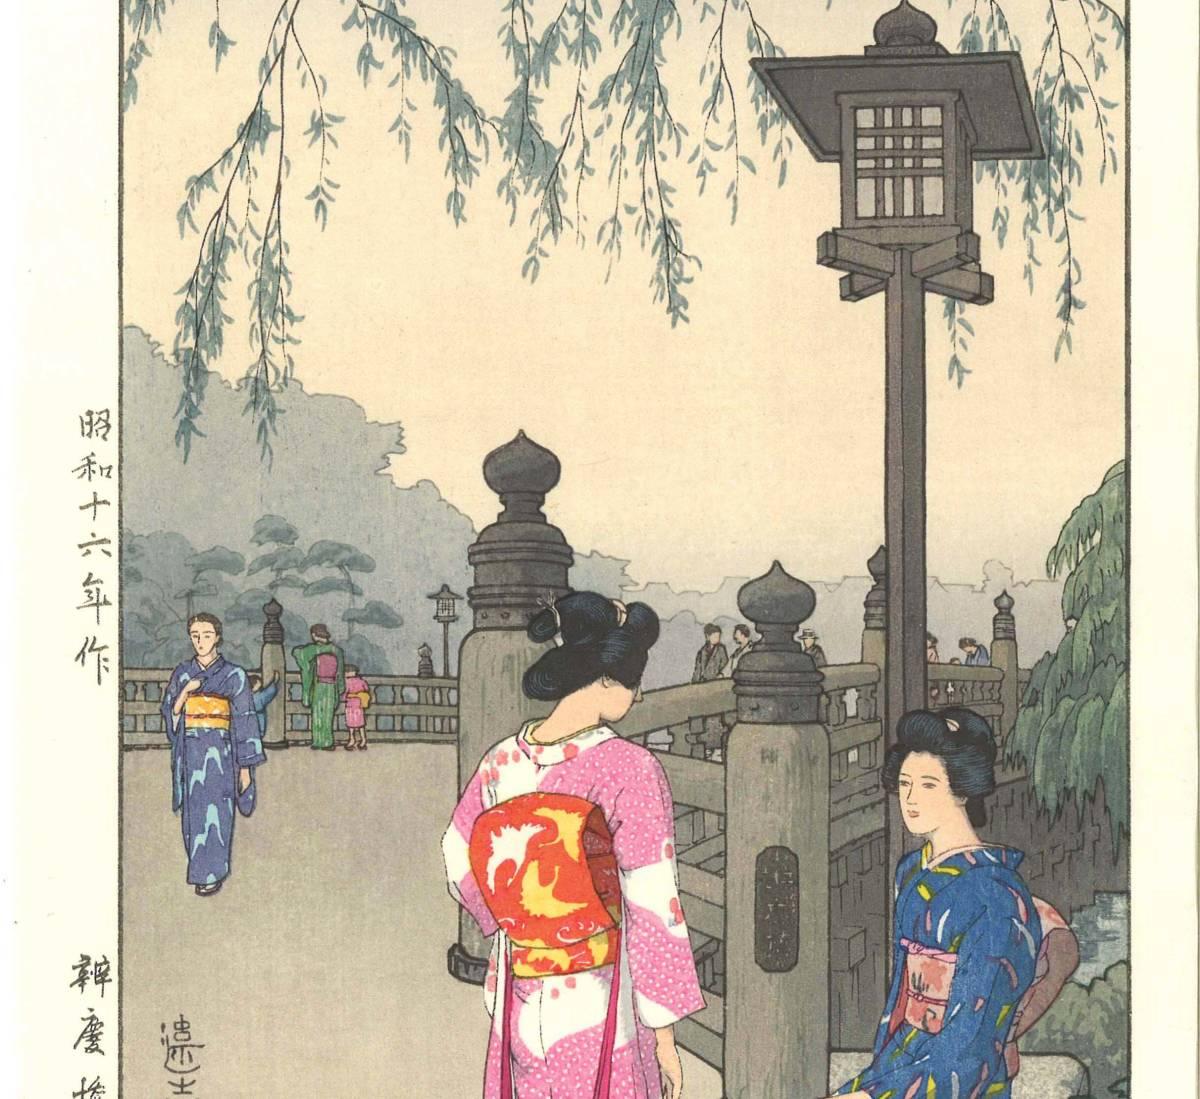 吉田遠志 木版画  014103 弁慶橋 (Benkei Bridge)  初摺1941年    最高峰の摺師の技をご堪能下さい!!_画像3